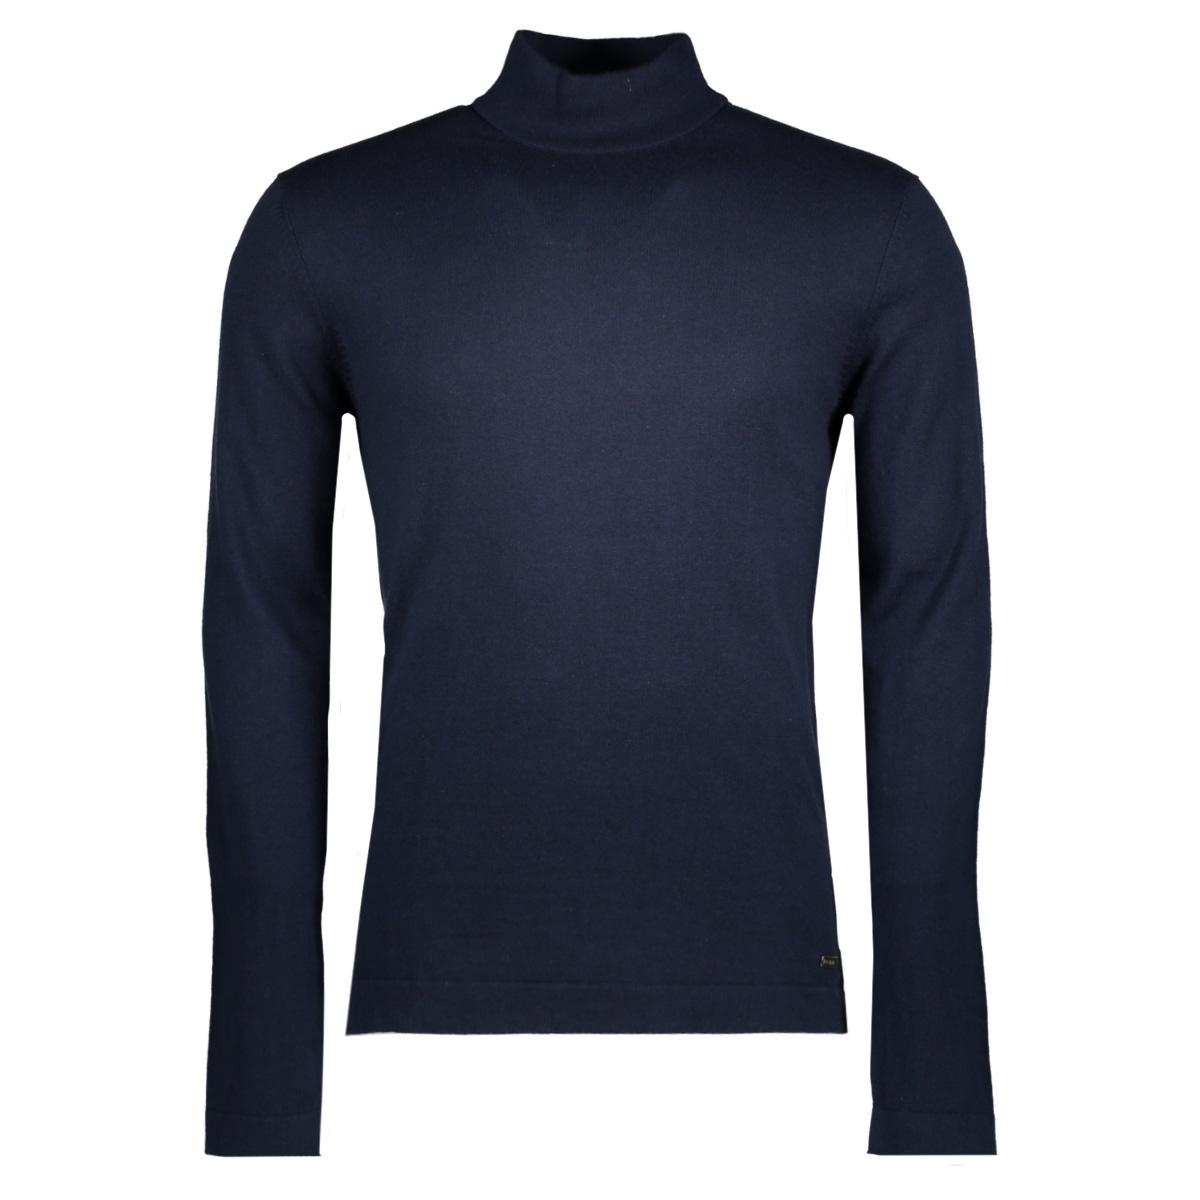 107cc2i018 edc sweater c400